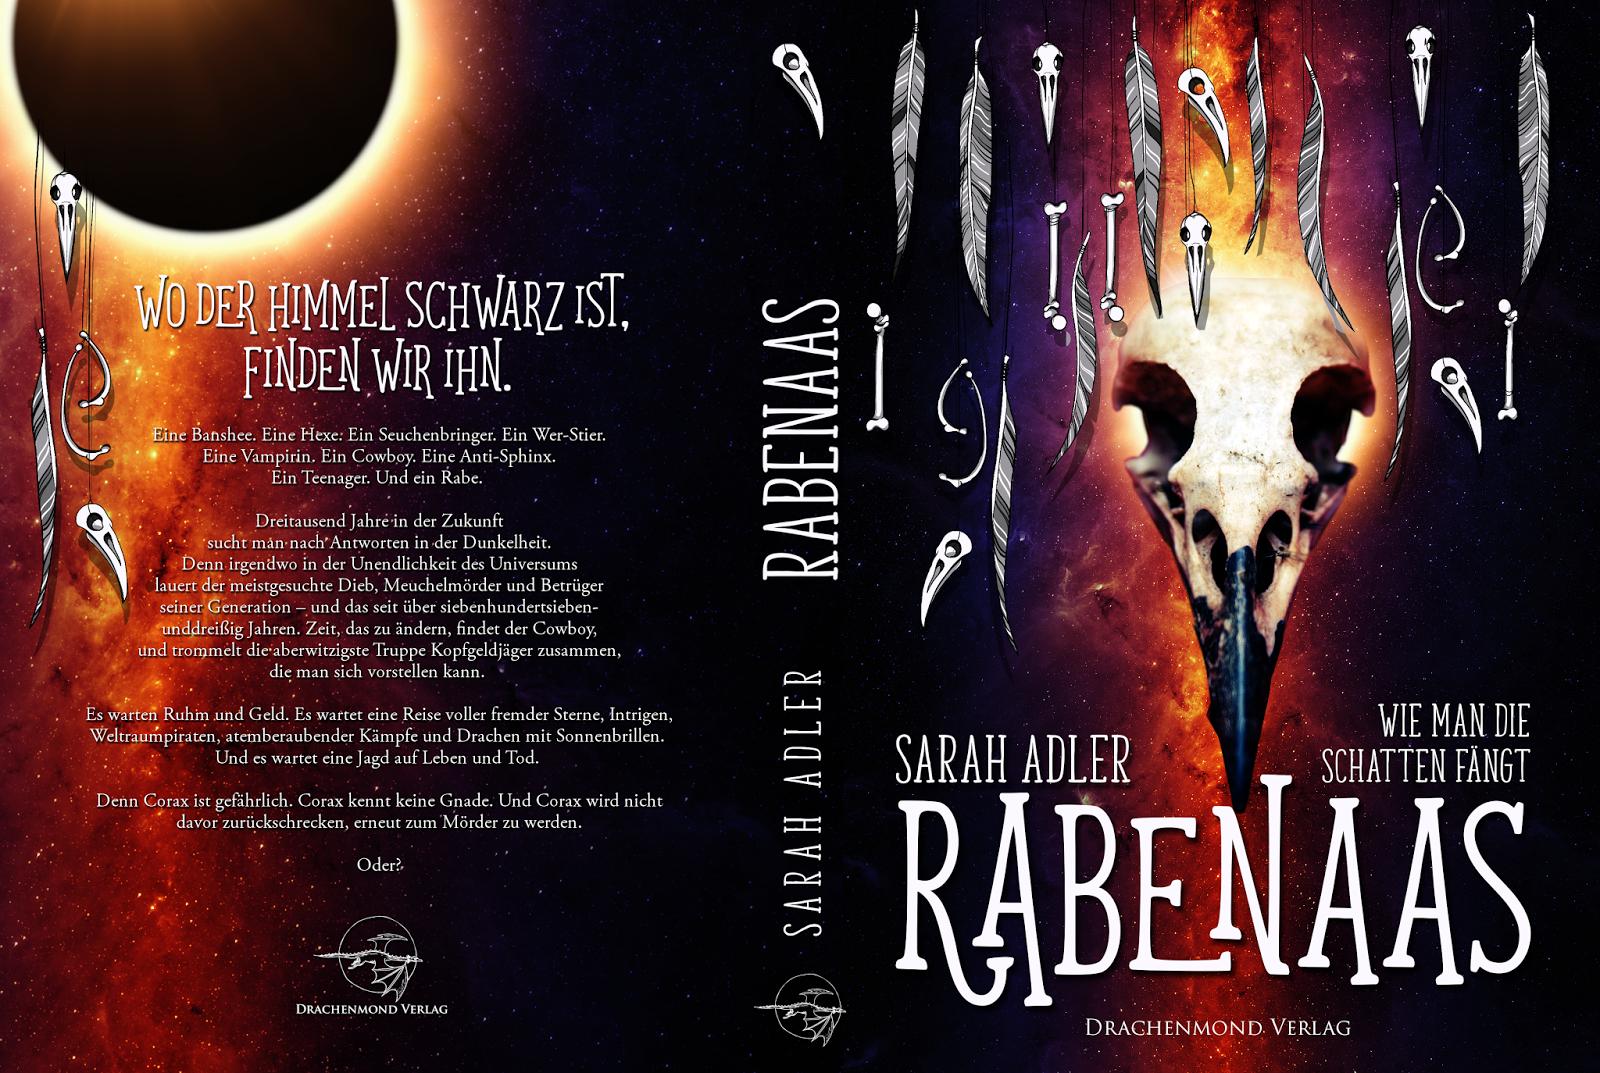 Sarah Adler - Rabenaas